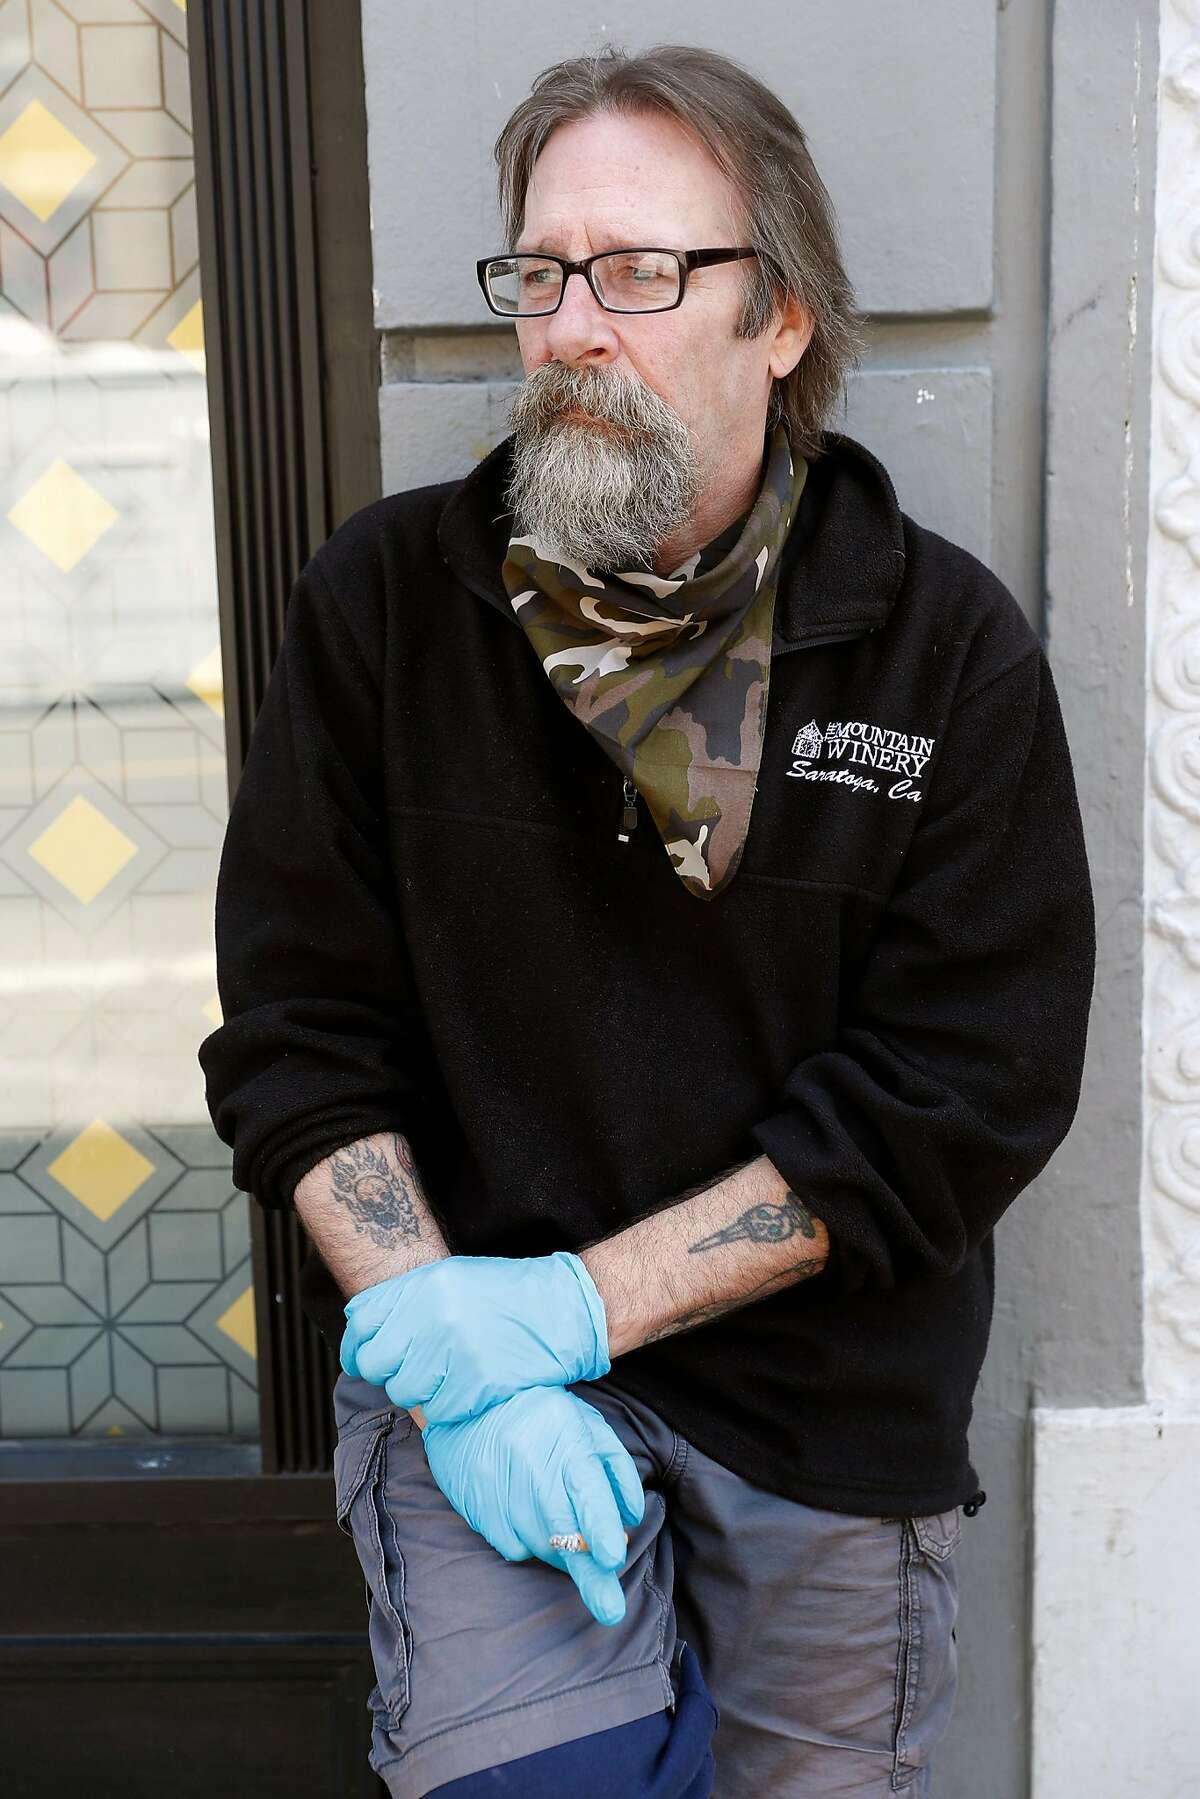 David White outside his Eddy Street hotel in San Francisco, Calif., on Sunday, June 21, 2020.